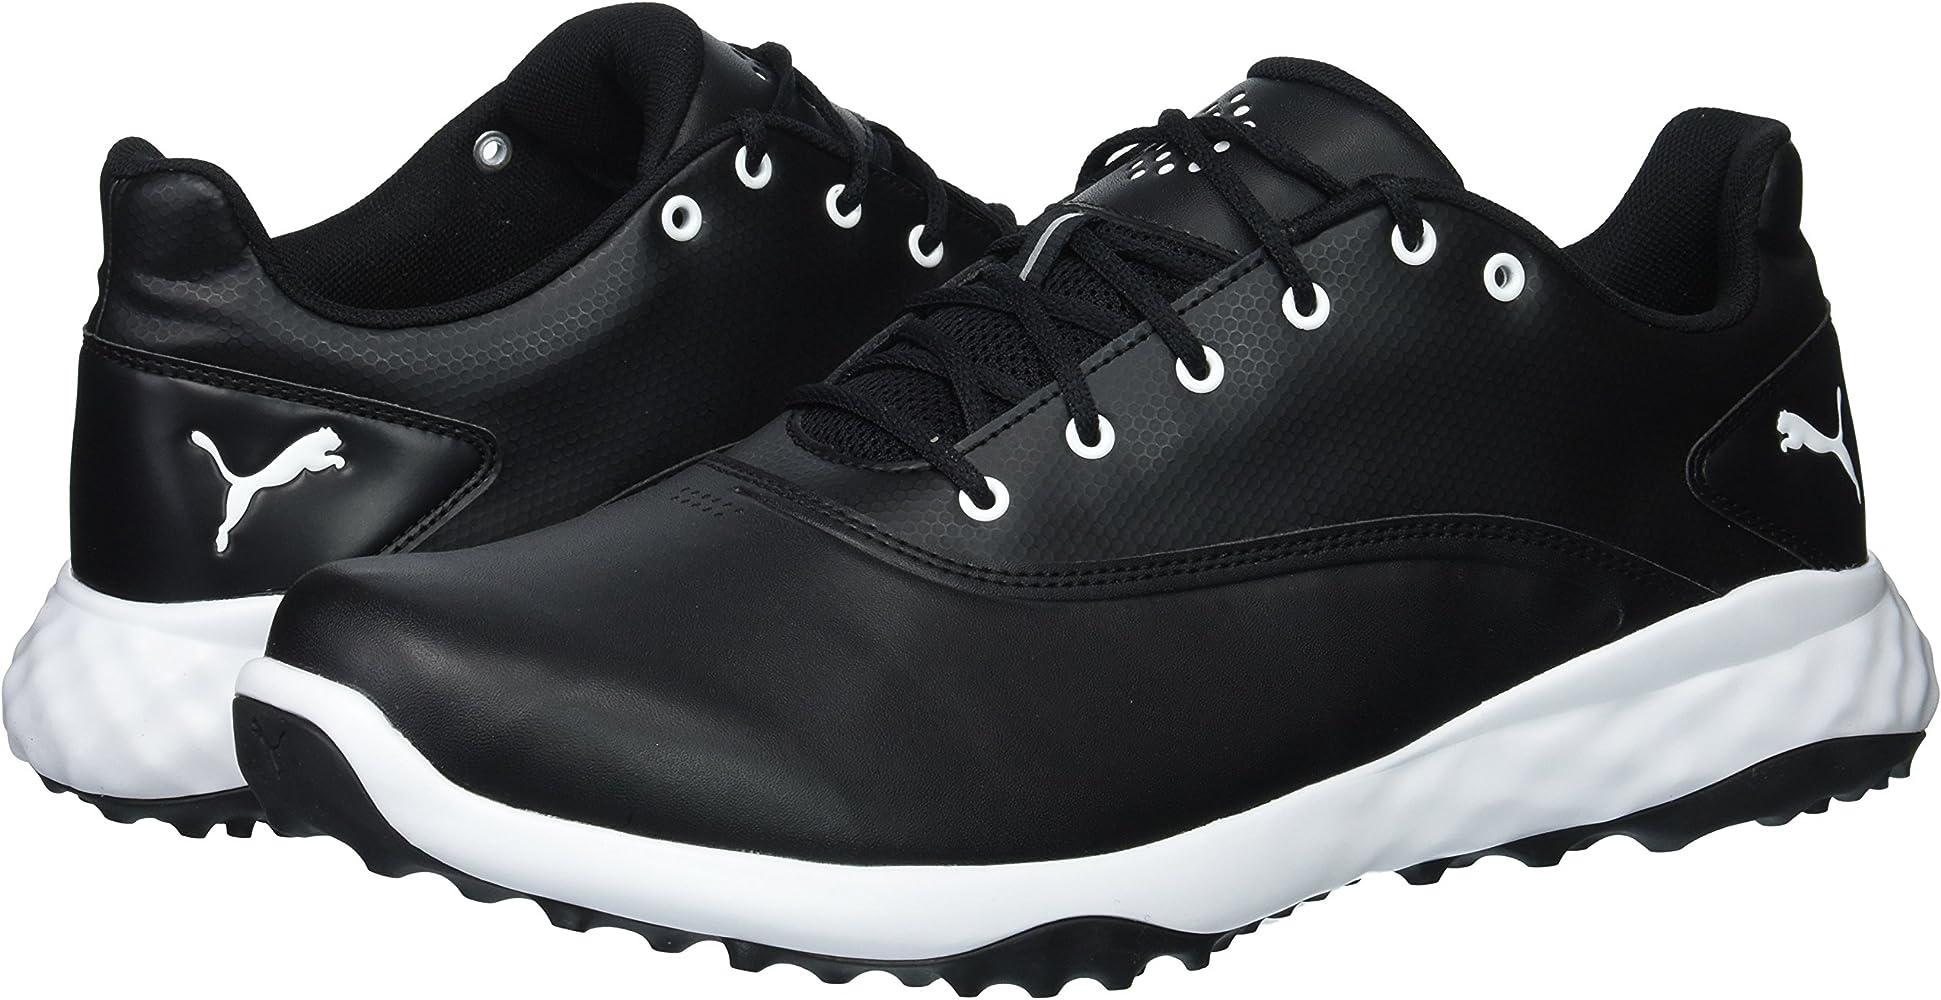 PUMA Golf Men's Grip Fusion Golf Shoe